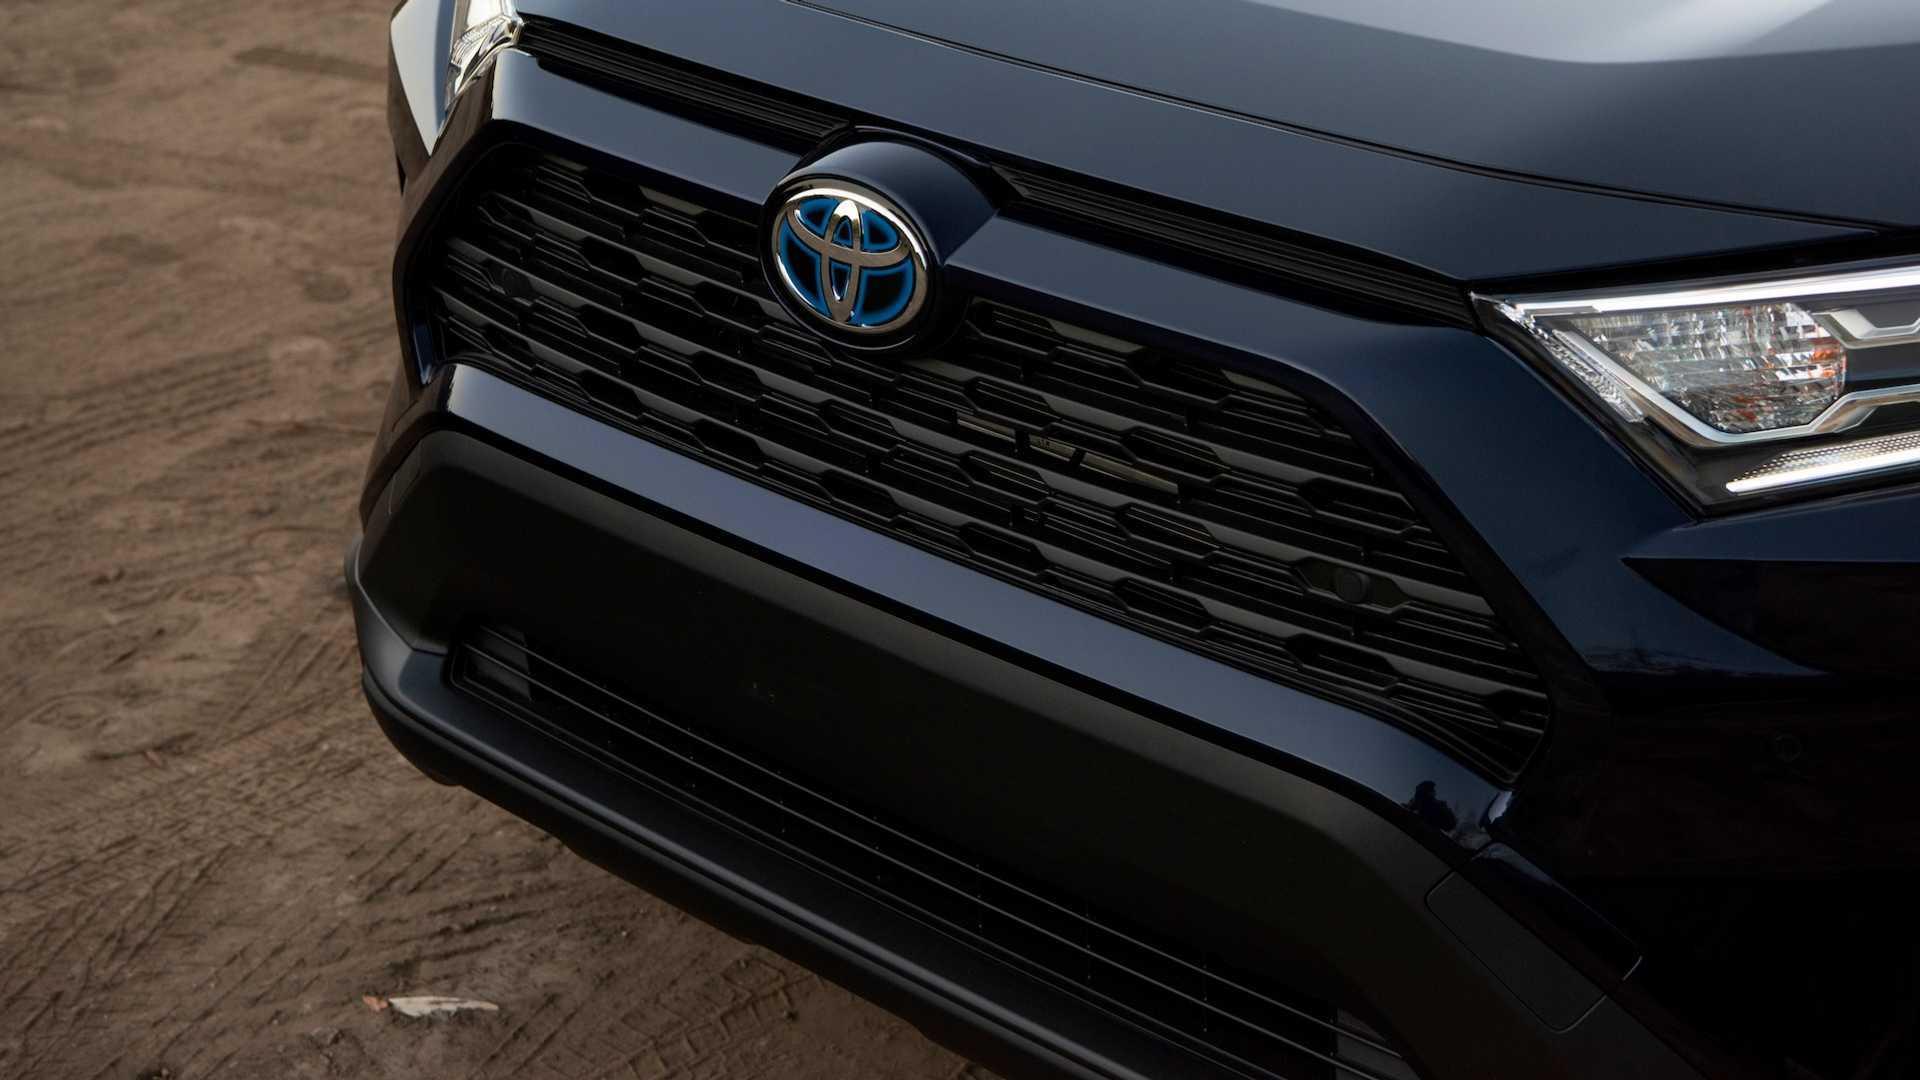 2019 Toyota Rav4 Hybrid First Drive Electric Boogaloo